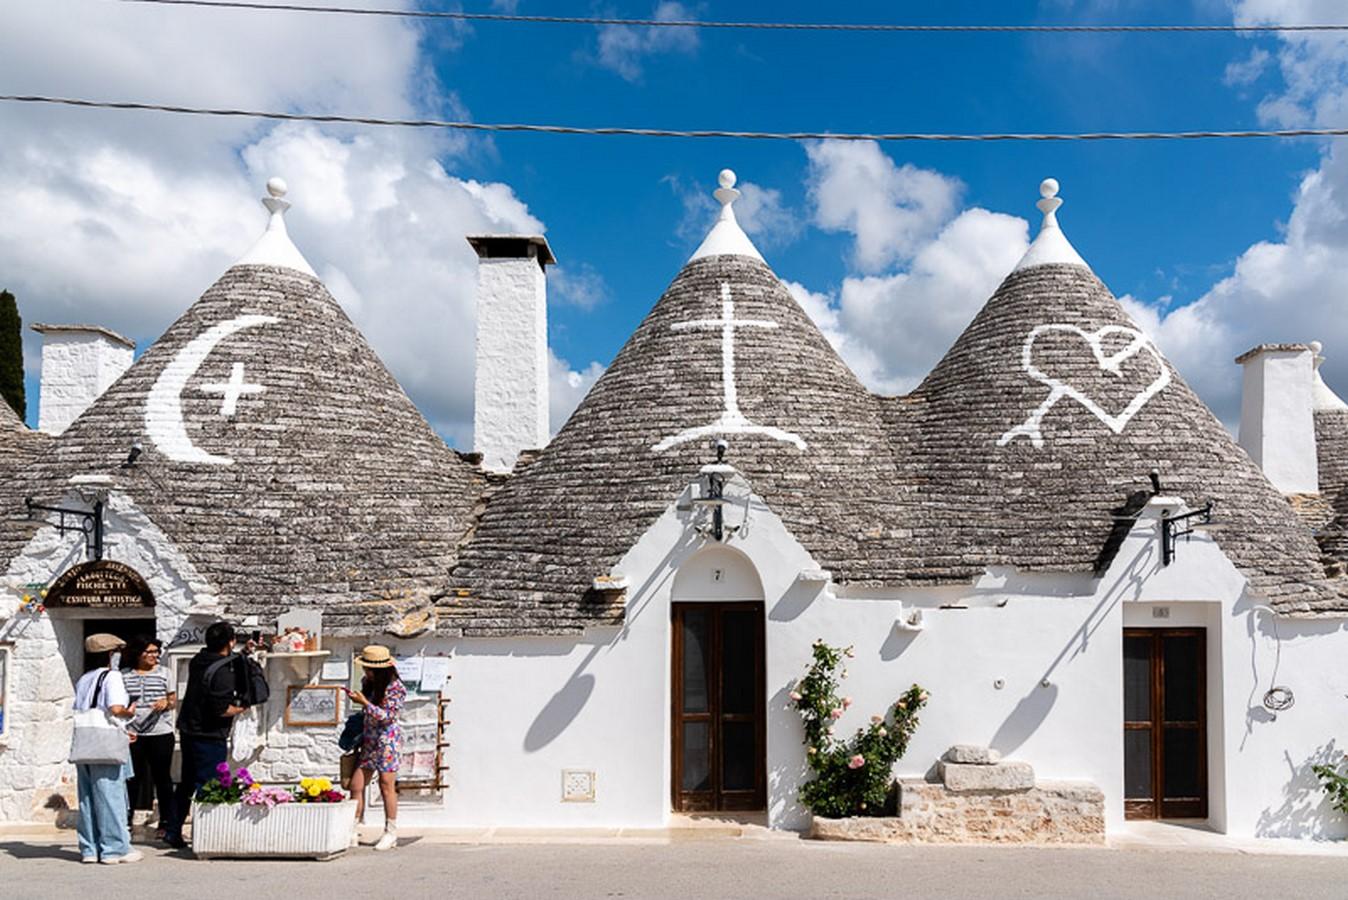 Alberobello, Puglia, region of Apulia; The Cone-shaped Trulli Houses - Sheet2